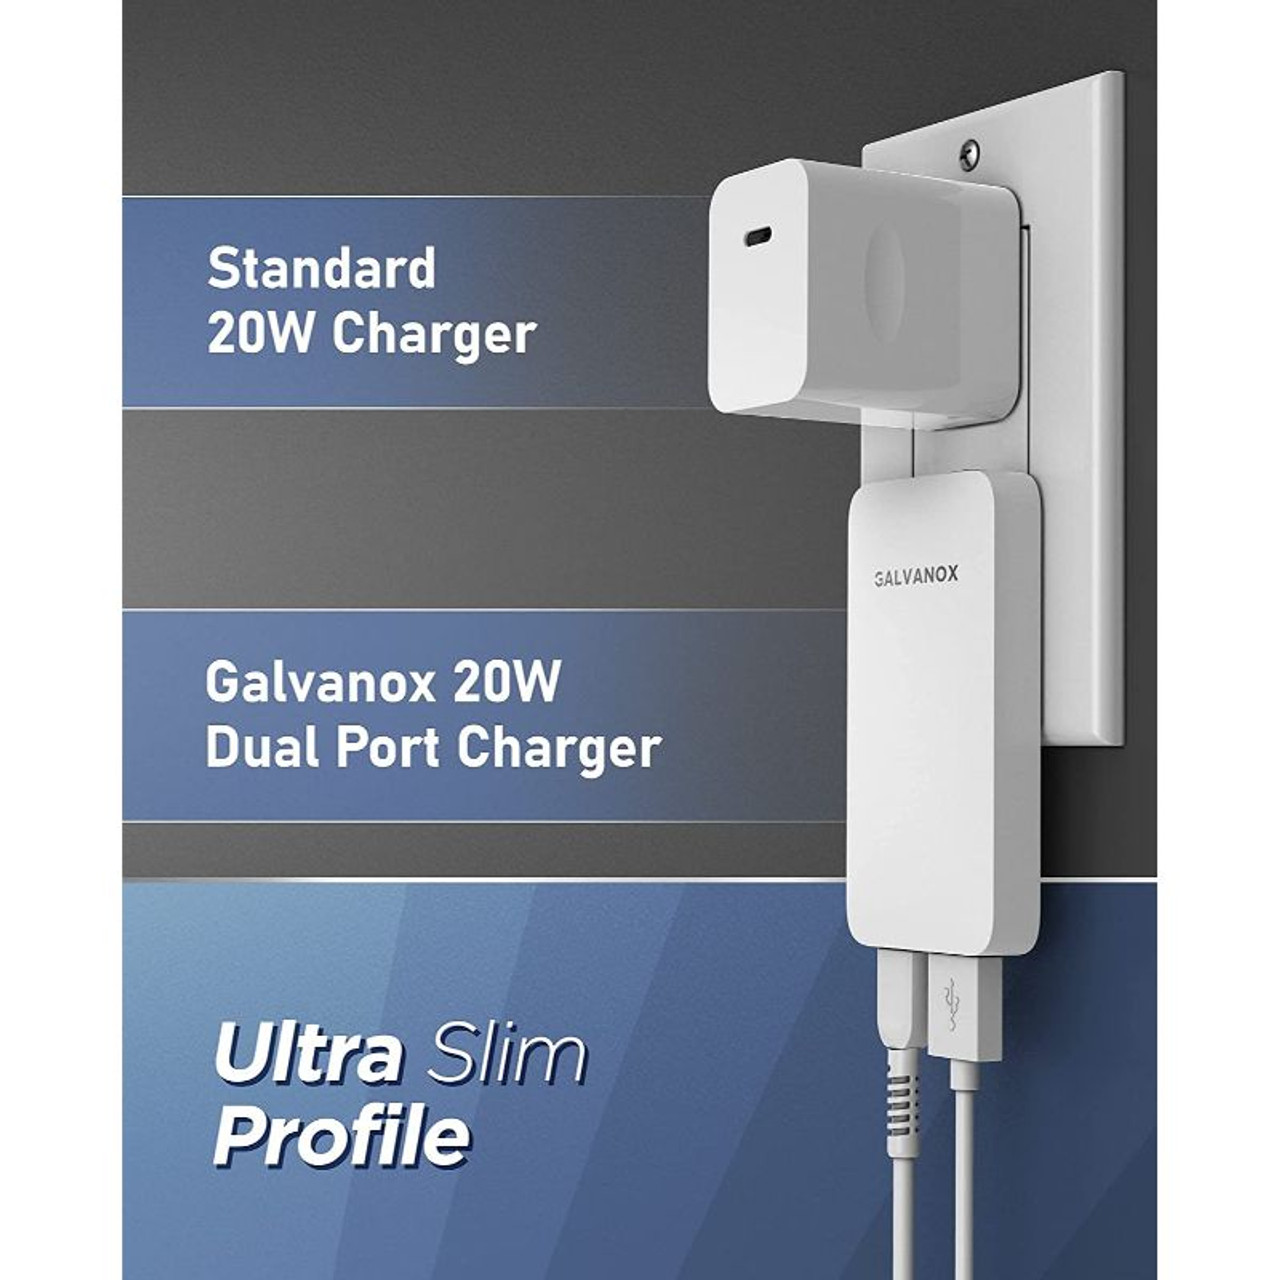 Galvanox Type C Flat Ultra Slim Multi Port Power Adapter for iPhone 12/Pro Max/11, Samsung